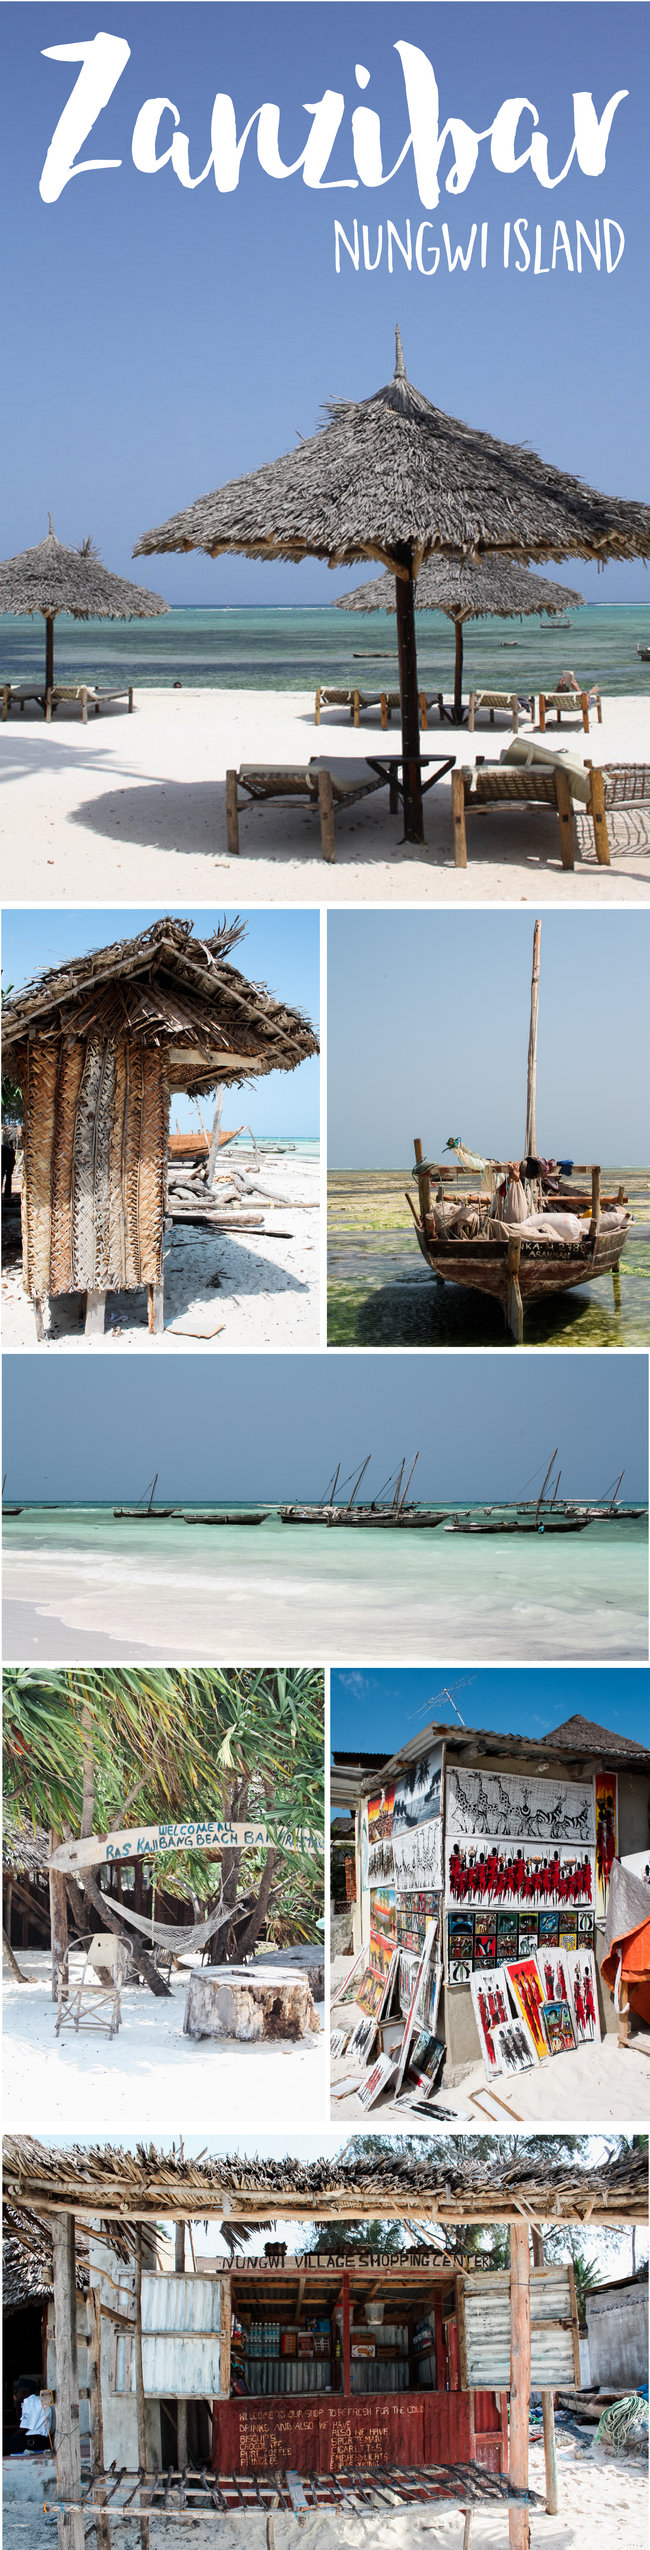 Nungwi Island Zanzibar 1